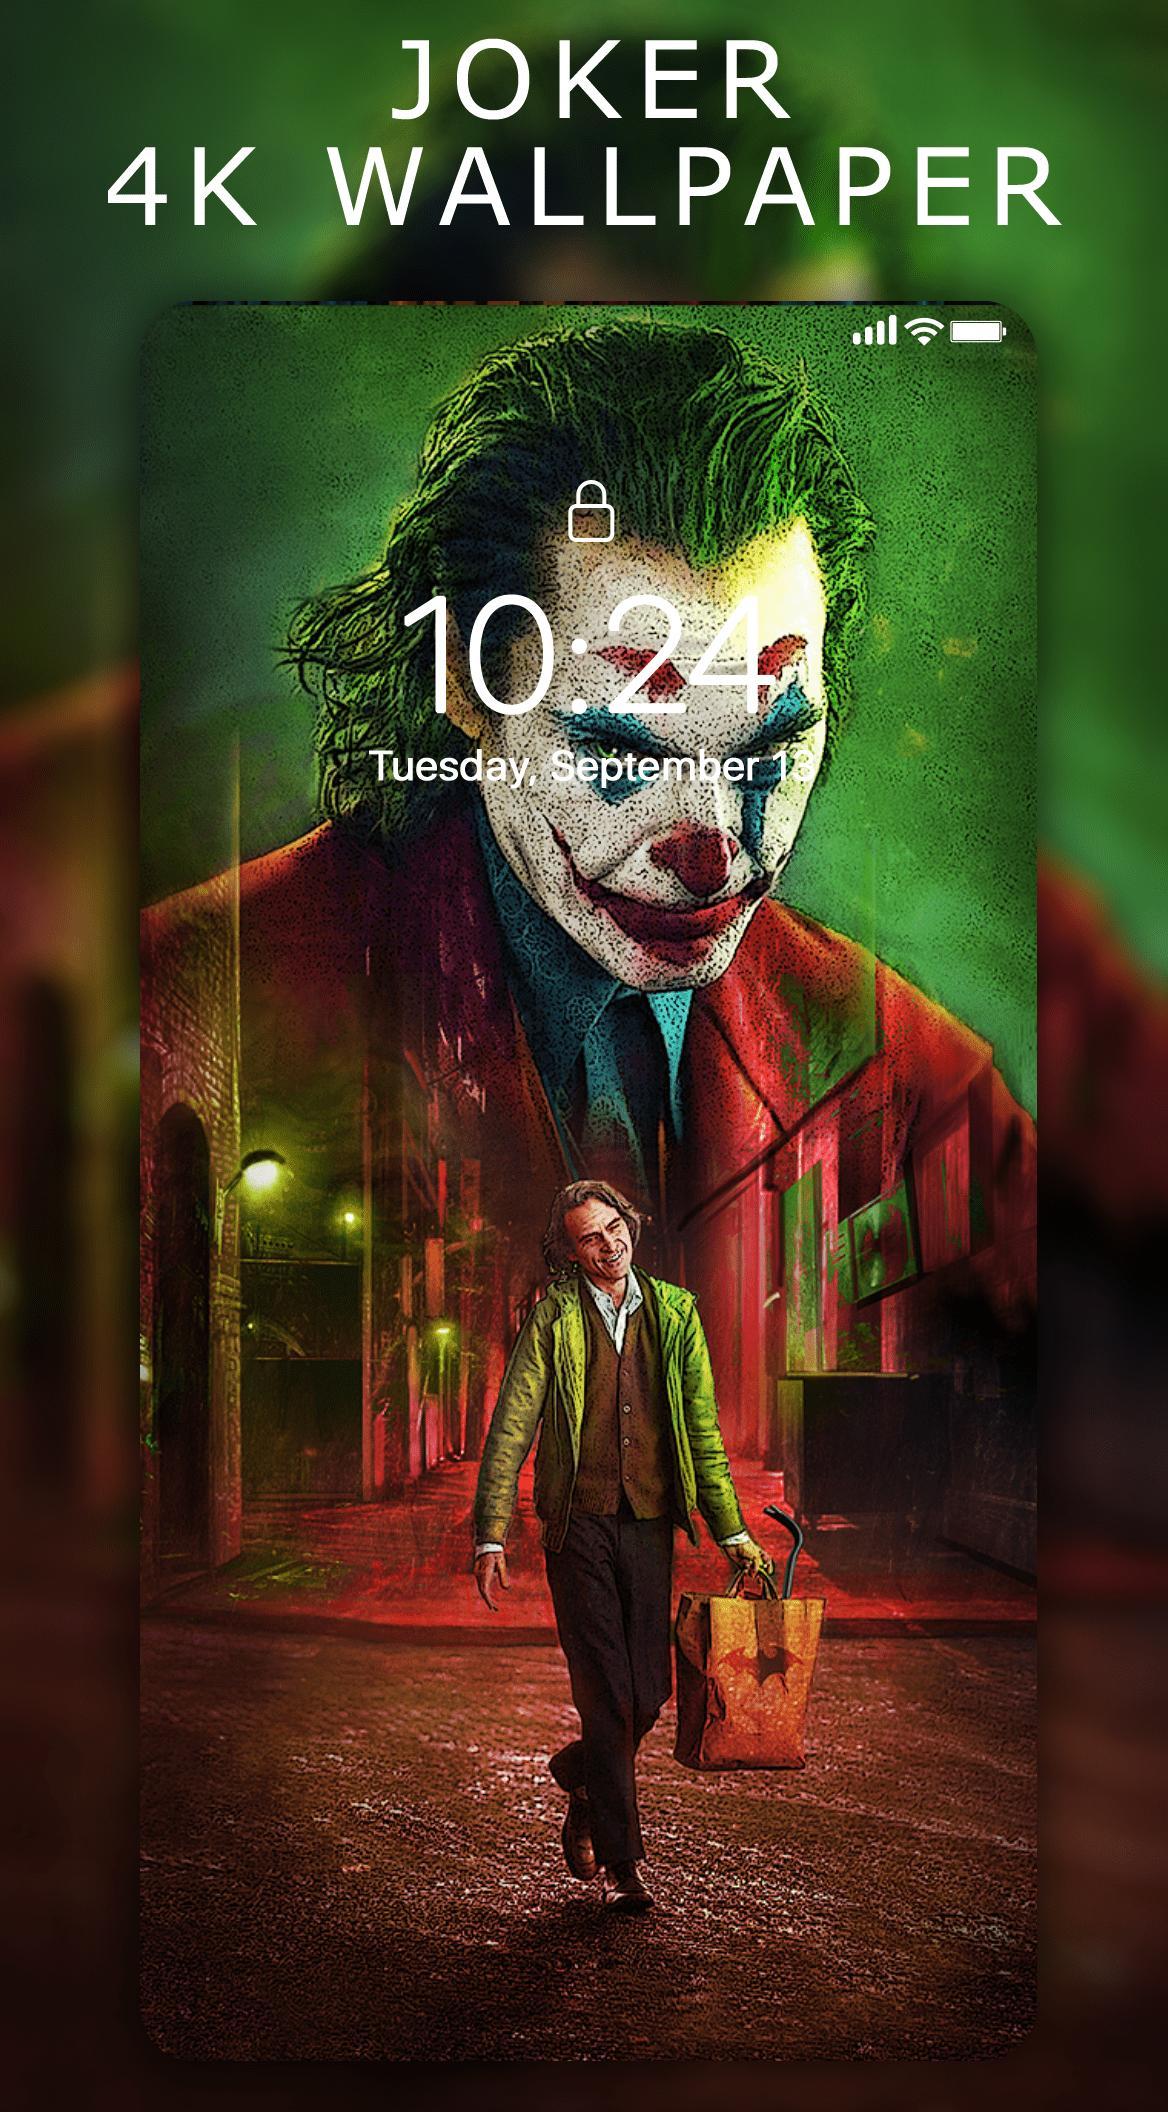 Joker Wallpaper 4k Ultra Hd For Android Apk Download